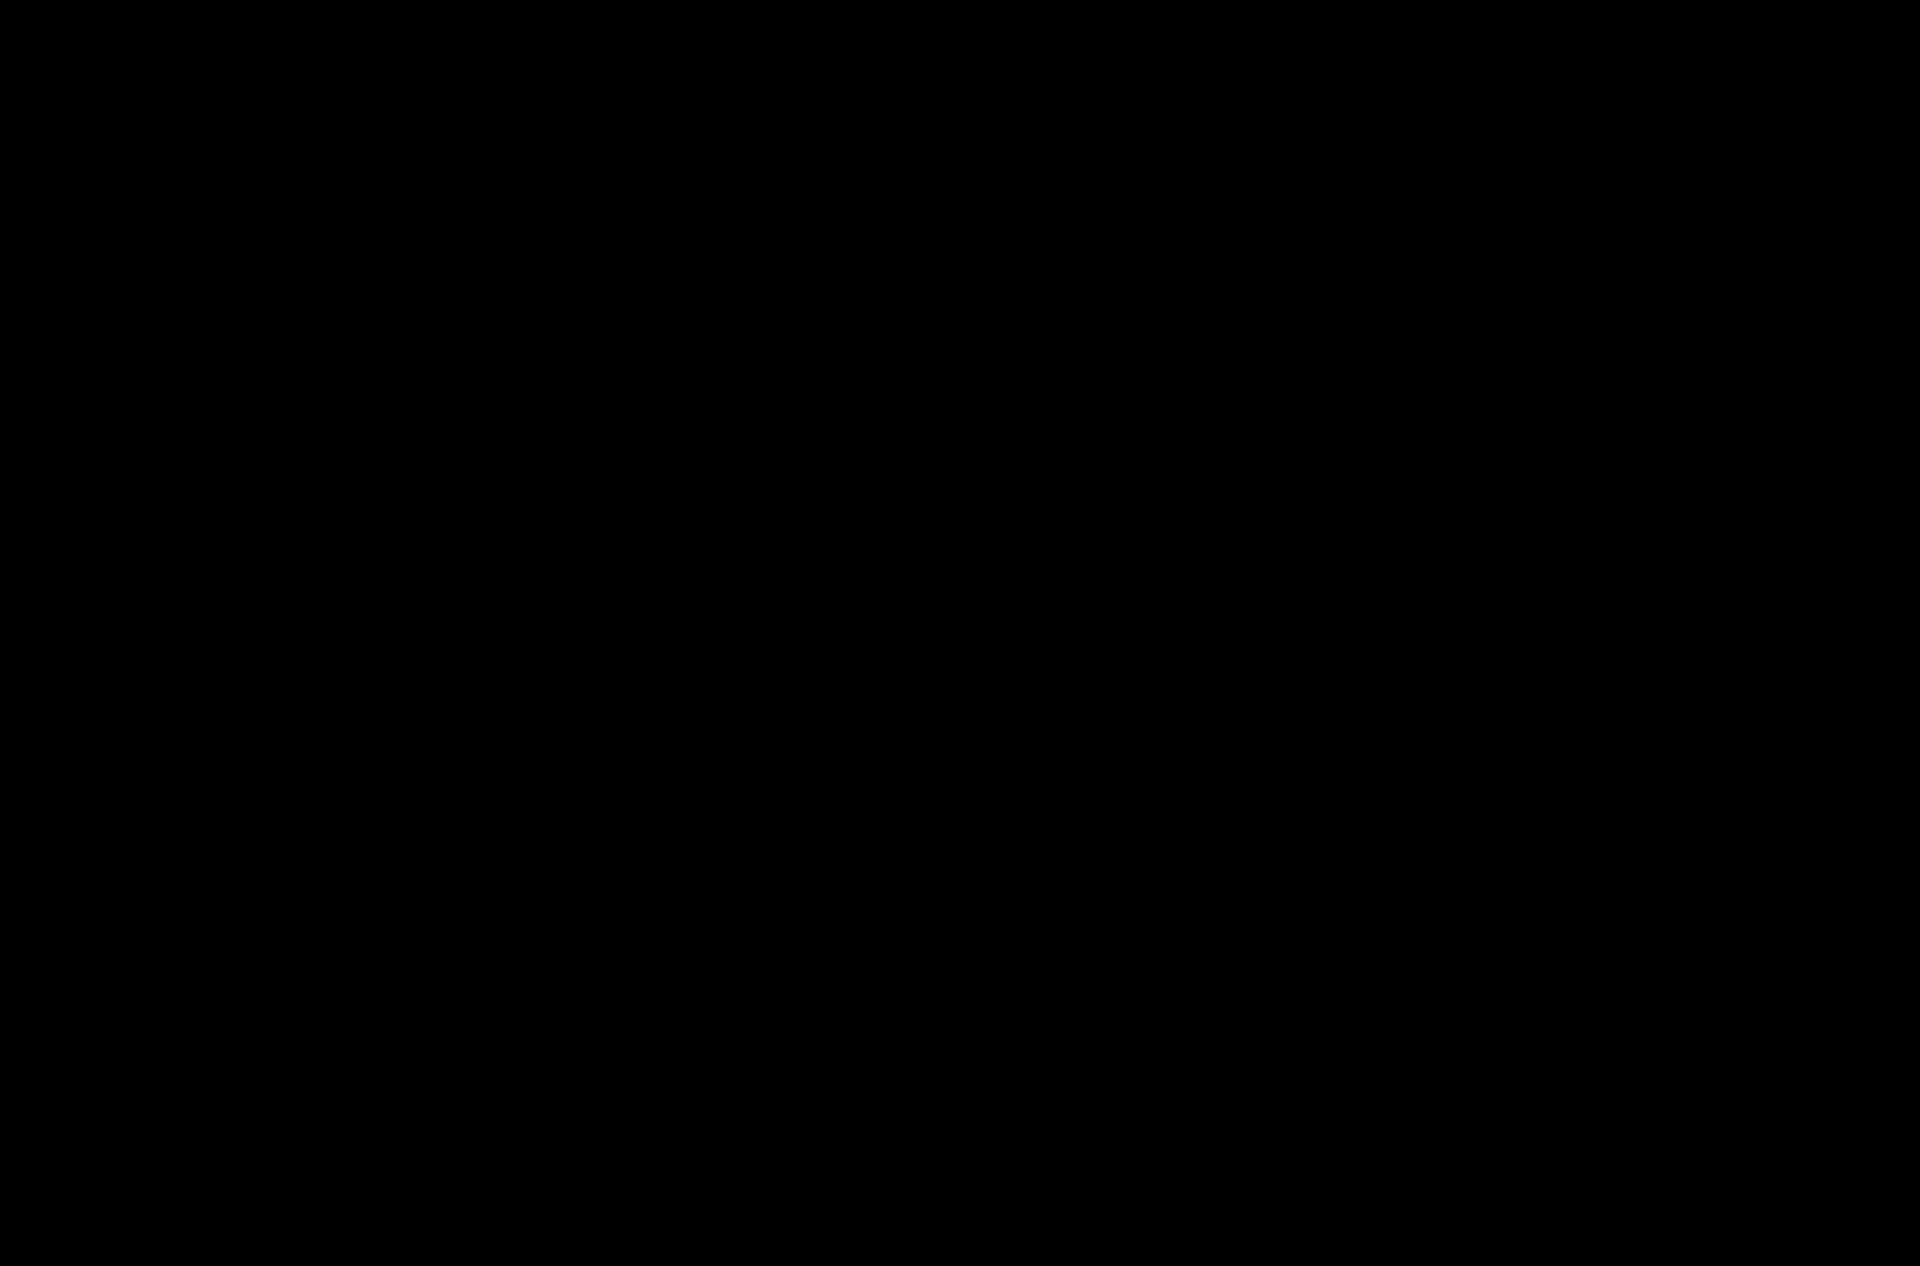 https://eqoxdgod6do.exactdn.com/wp-content/uploads/2021/02/Office1-scaled-e1612977317199.jpeg?strip=all&lossy=1&w=1920&ssl=1